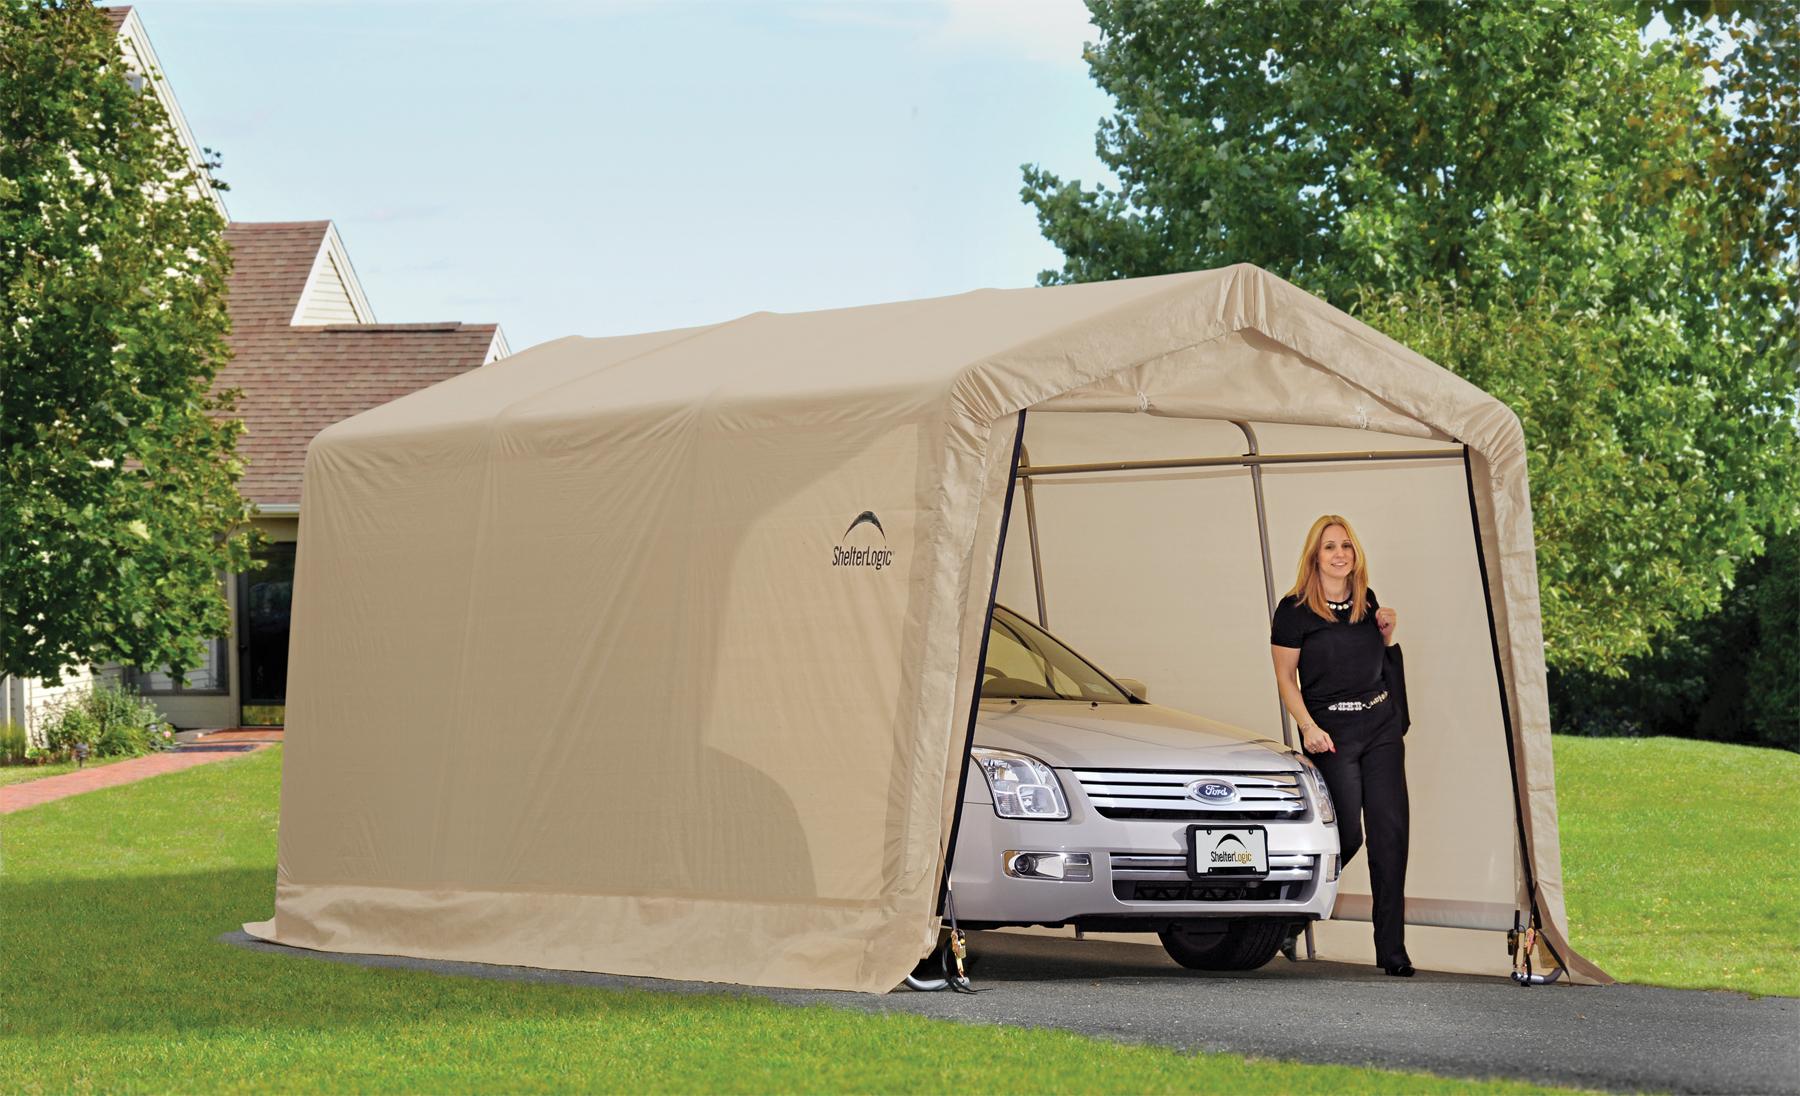 Autoshelter 174 10x15 Peak Roof Portable Garage Creative